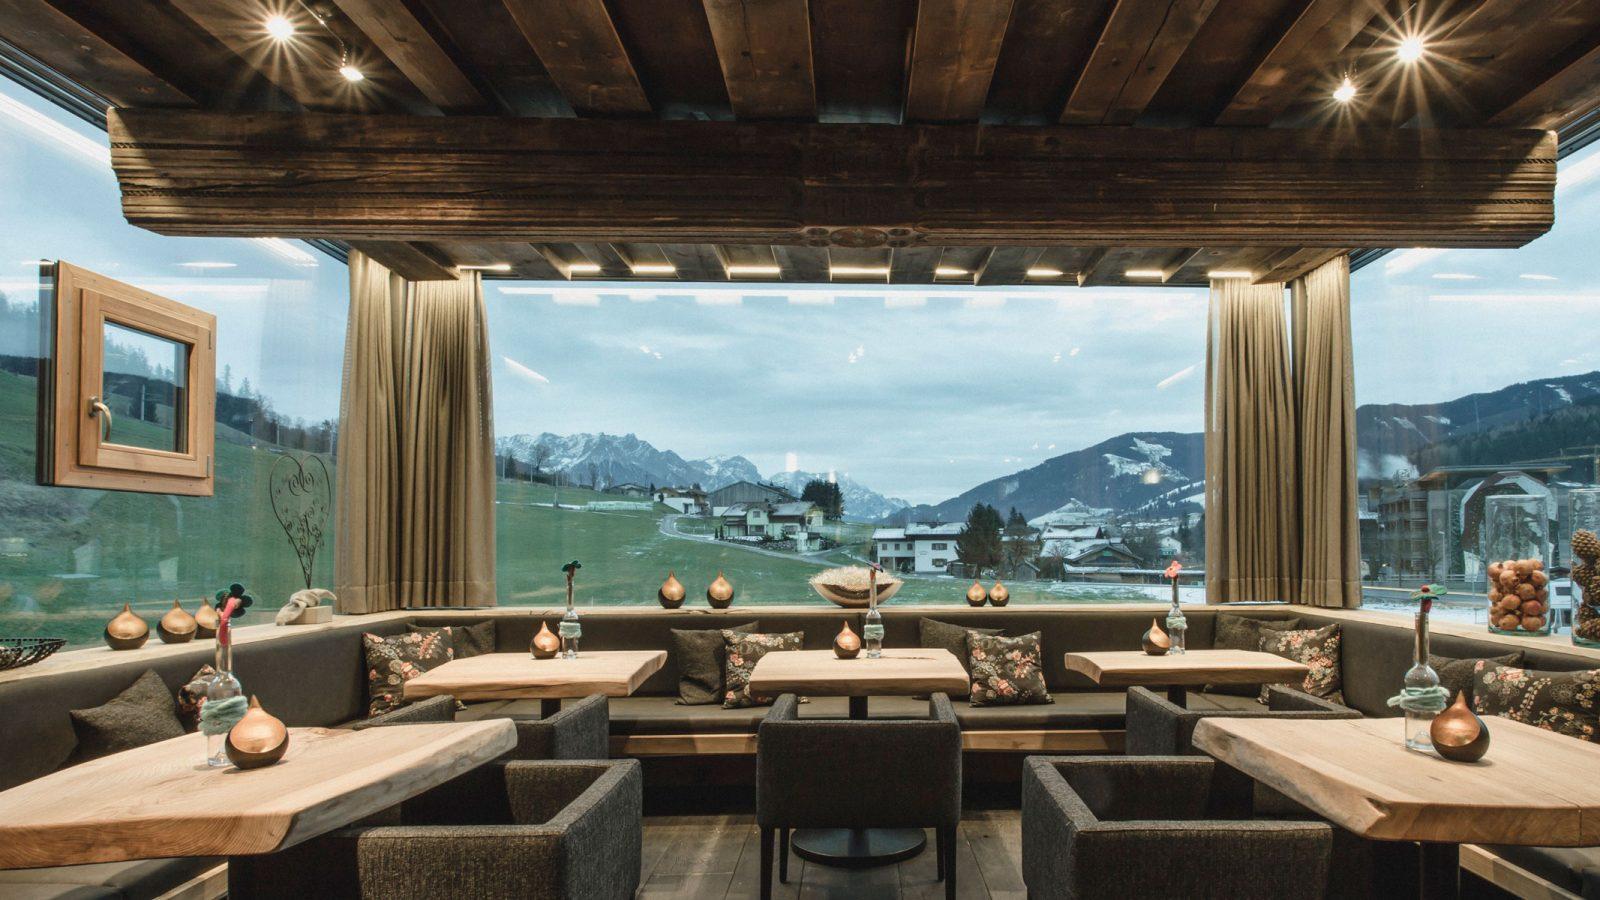 6 leistbare designhotels in sterreich maxima. Black Bedroom Furniture Sets. Home Design Ideas